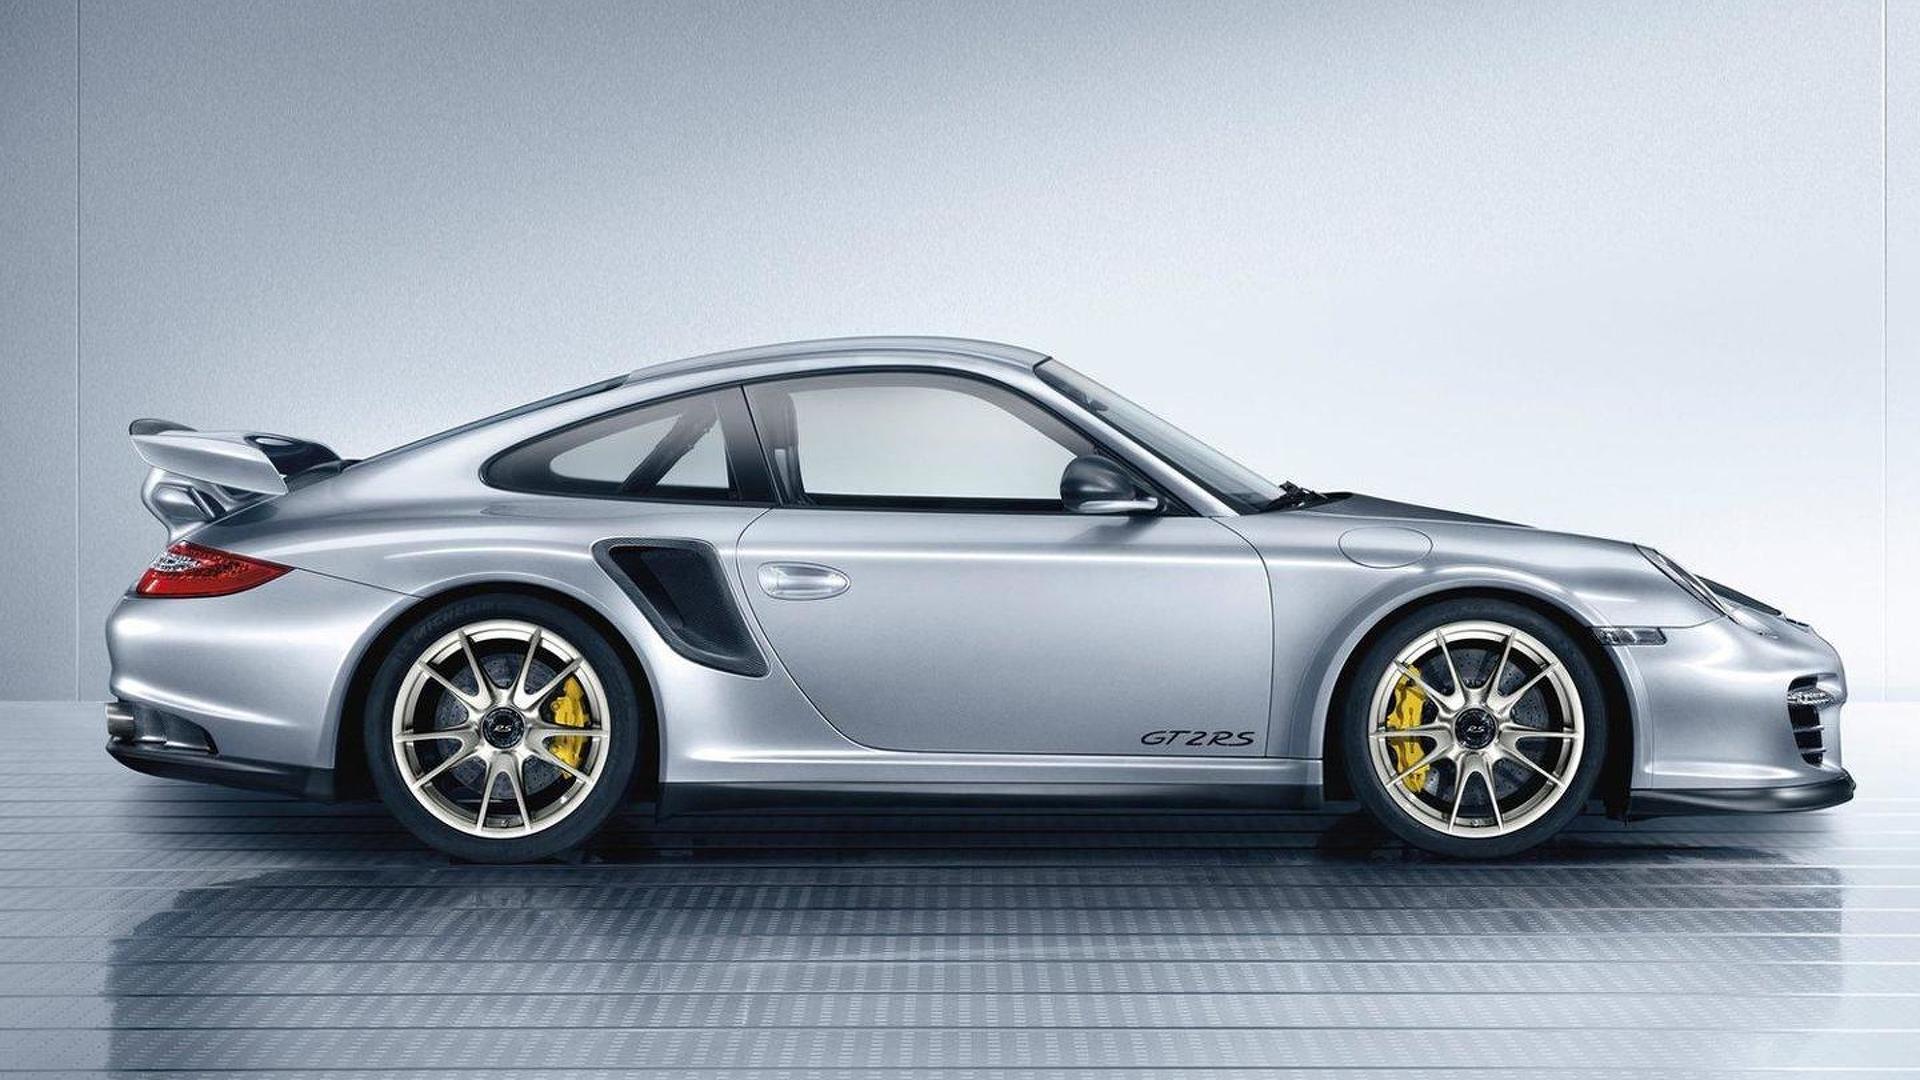 911 GT2 RS sold out - Porsche announces on Twitter